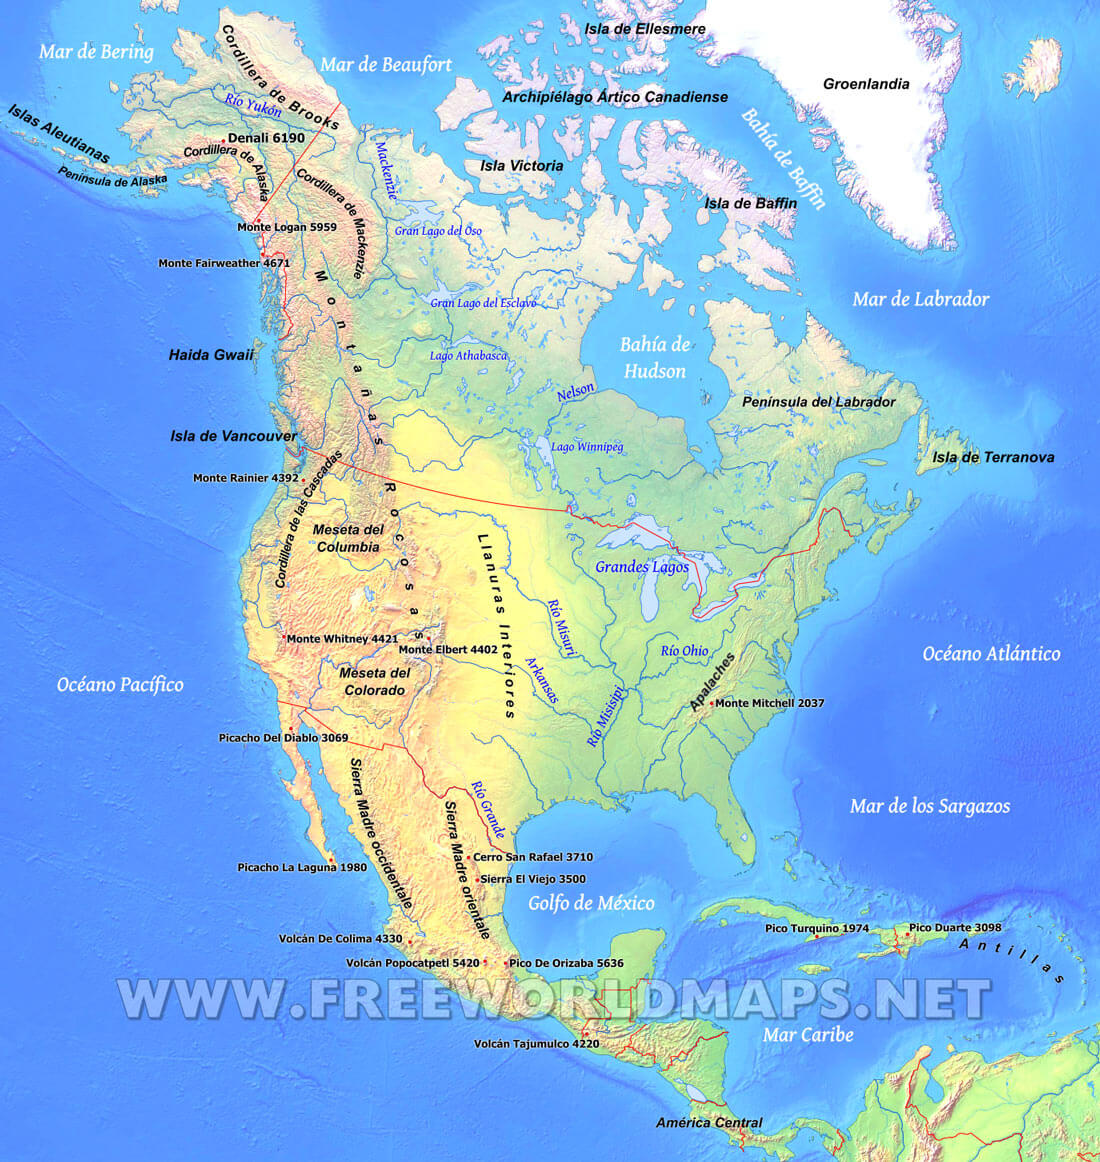 Mapa fsico de Norteamrica